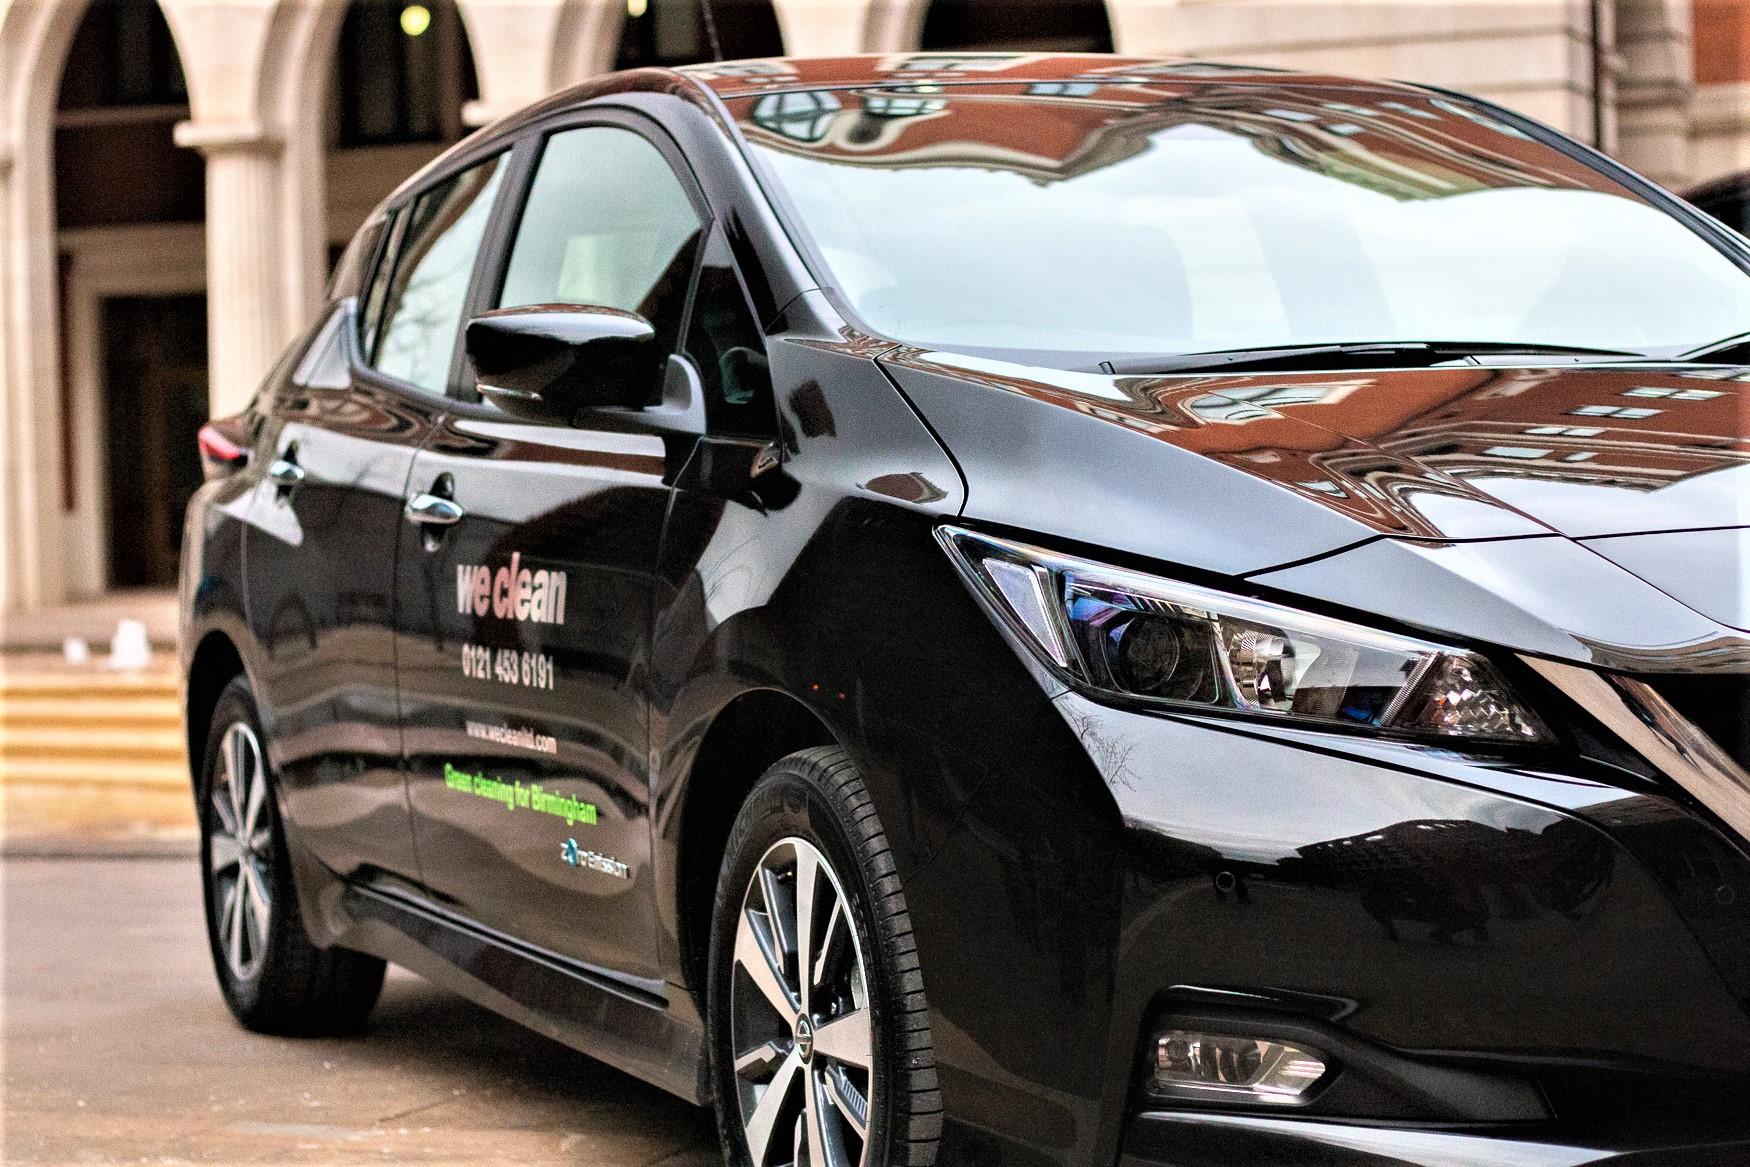 We-Clean-Green-in-Birmingham-Nissan-Leaf Cleaning Green - Birmingham Cleaning Company Goes Electric